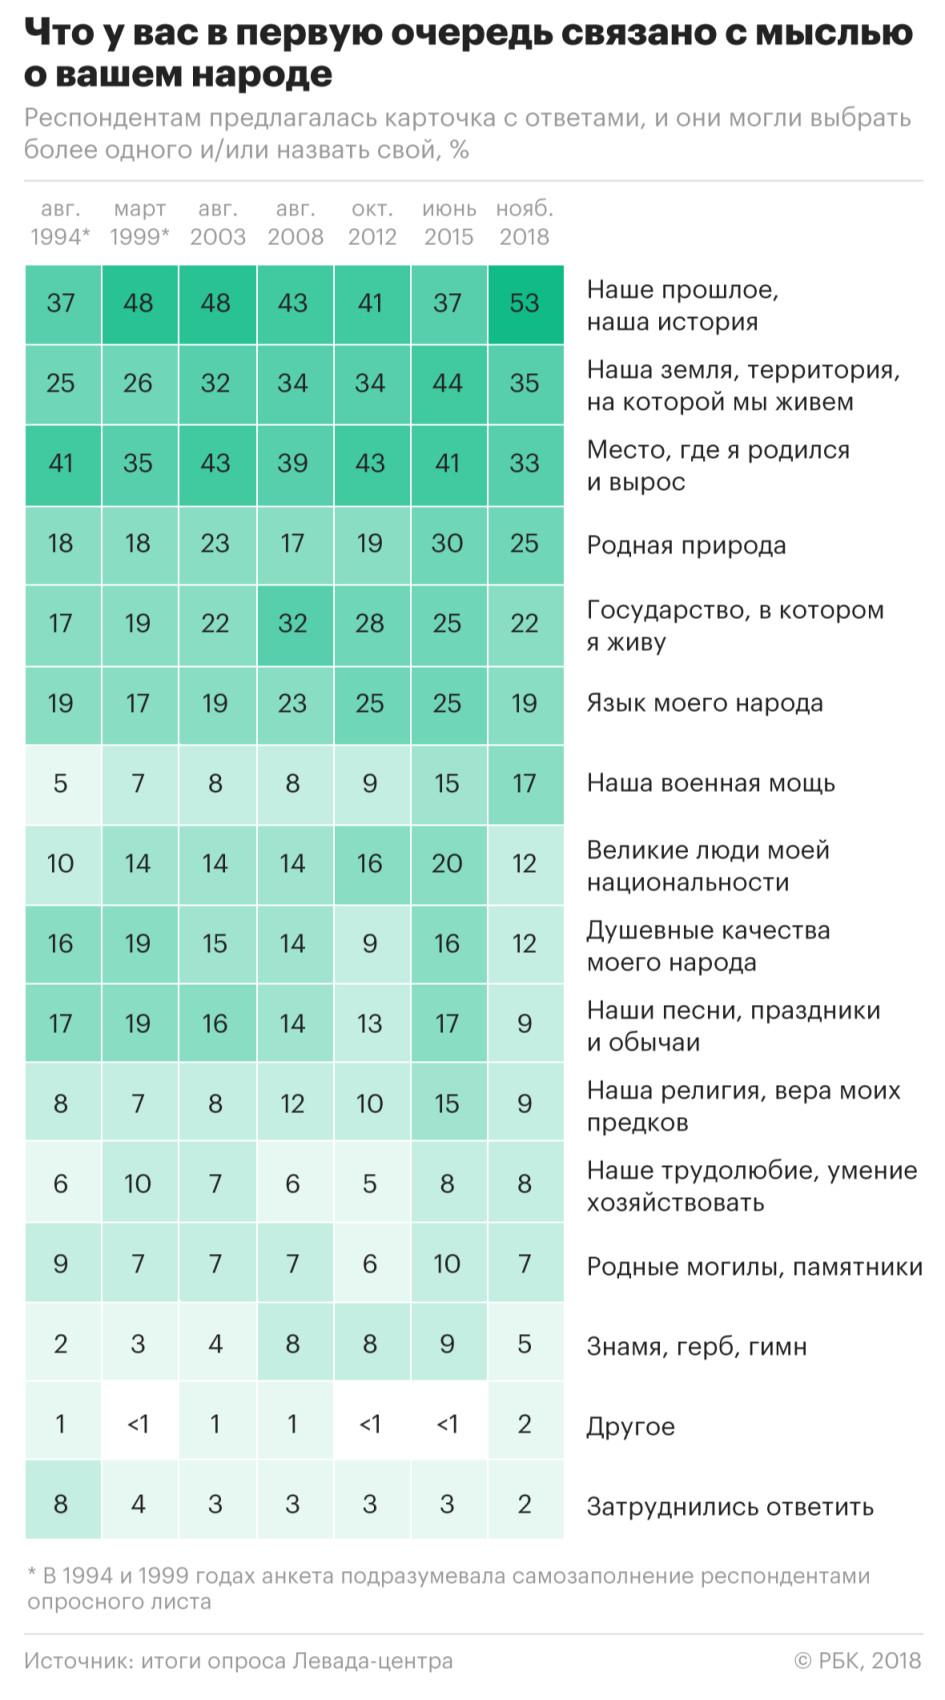 https://s0.rbk.ru/v6_top_pics/resized/945xH/media/img/2/78/755475672736782.jpeg